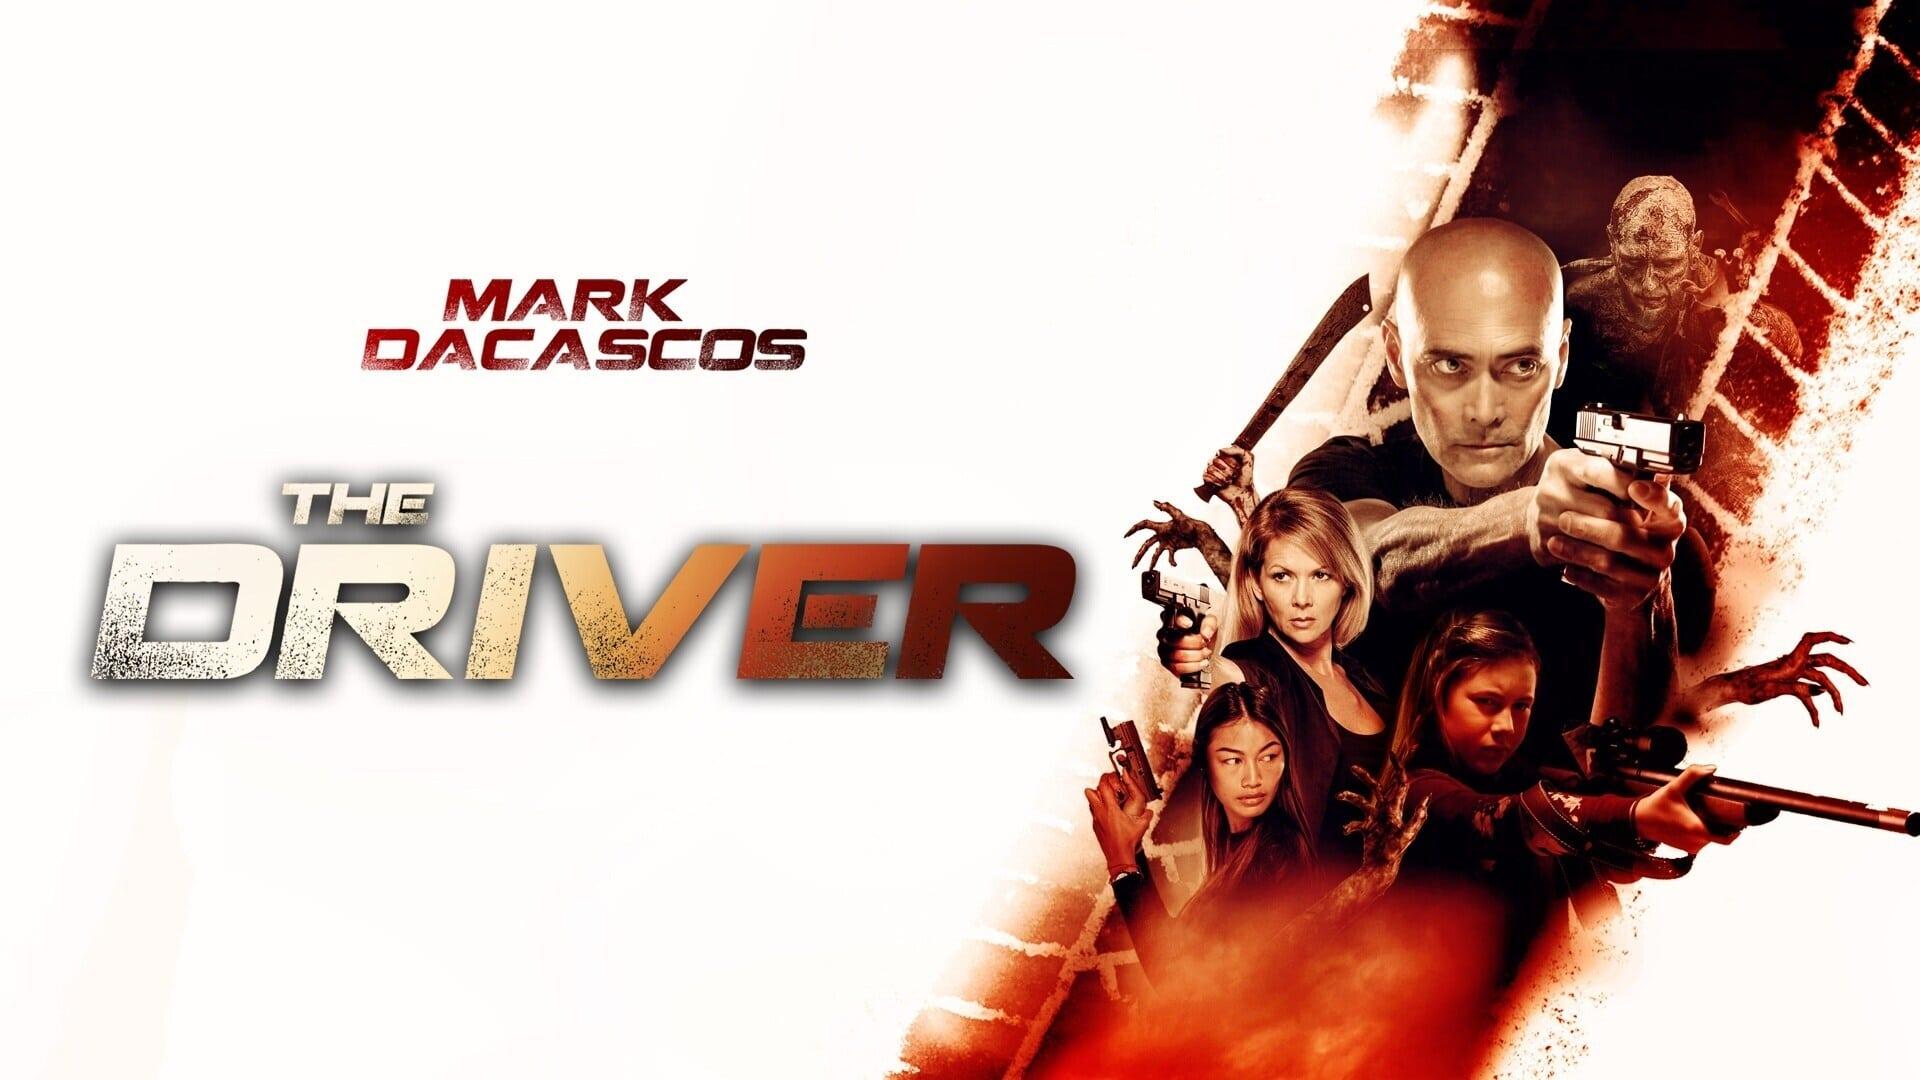 VER The Driver (2019) pelicula completa en español latino HD